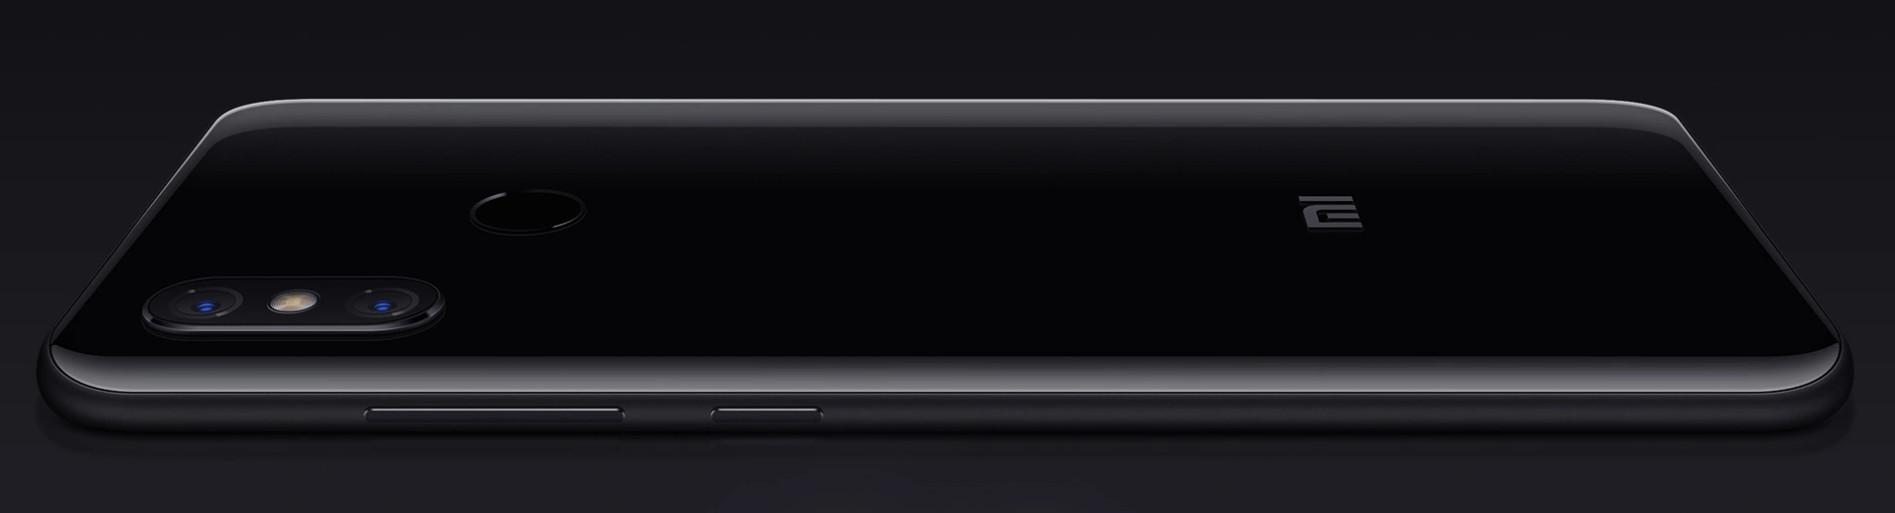 "Xiaomi Mi 8, el ""iPhone X chino"" llega a España por 499 euros 34"